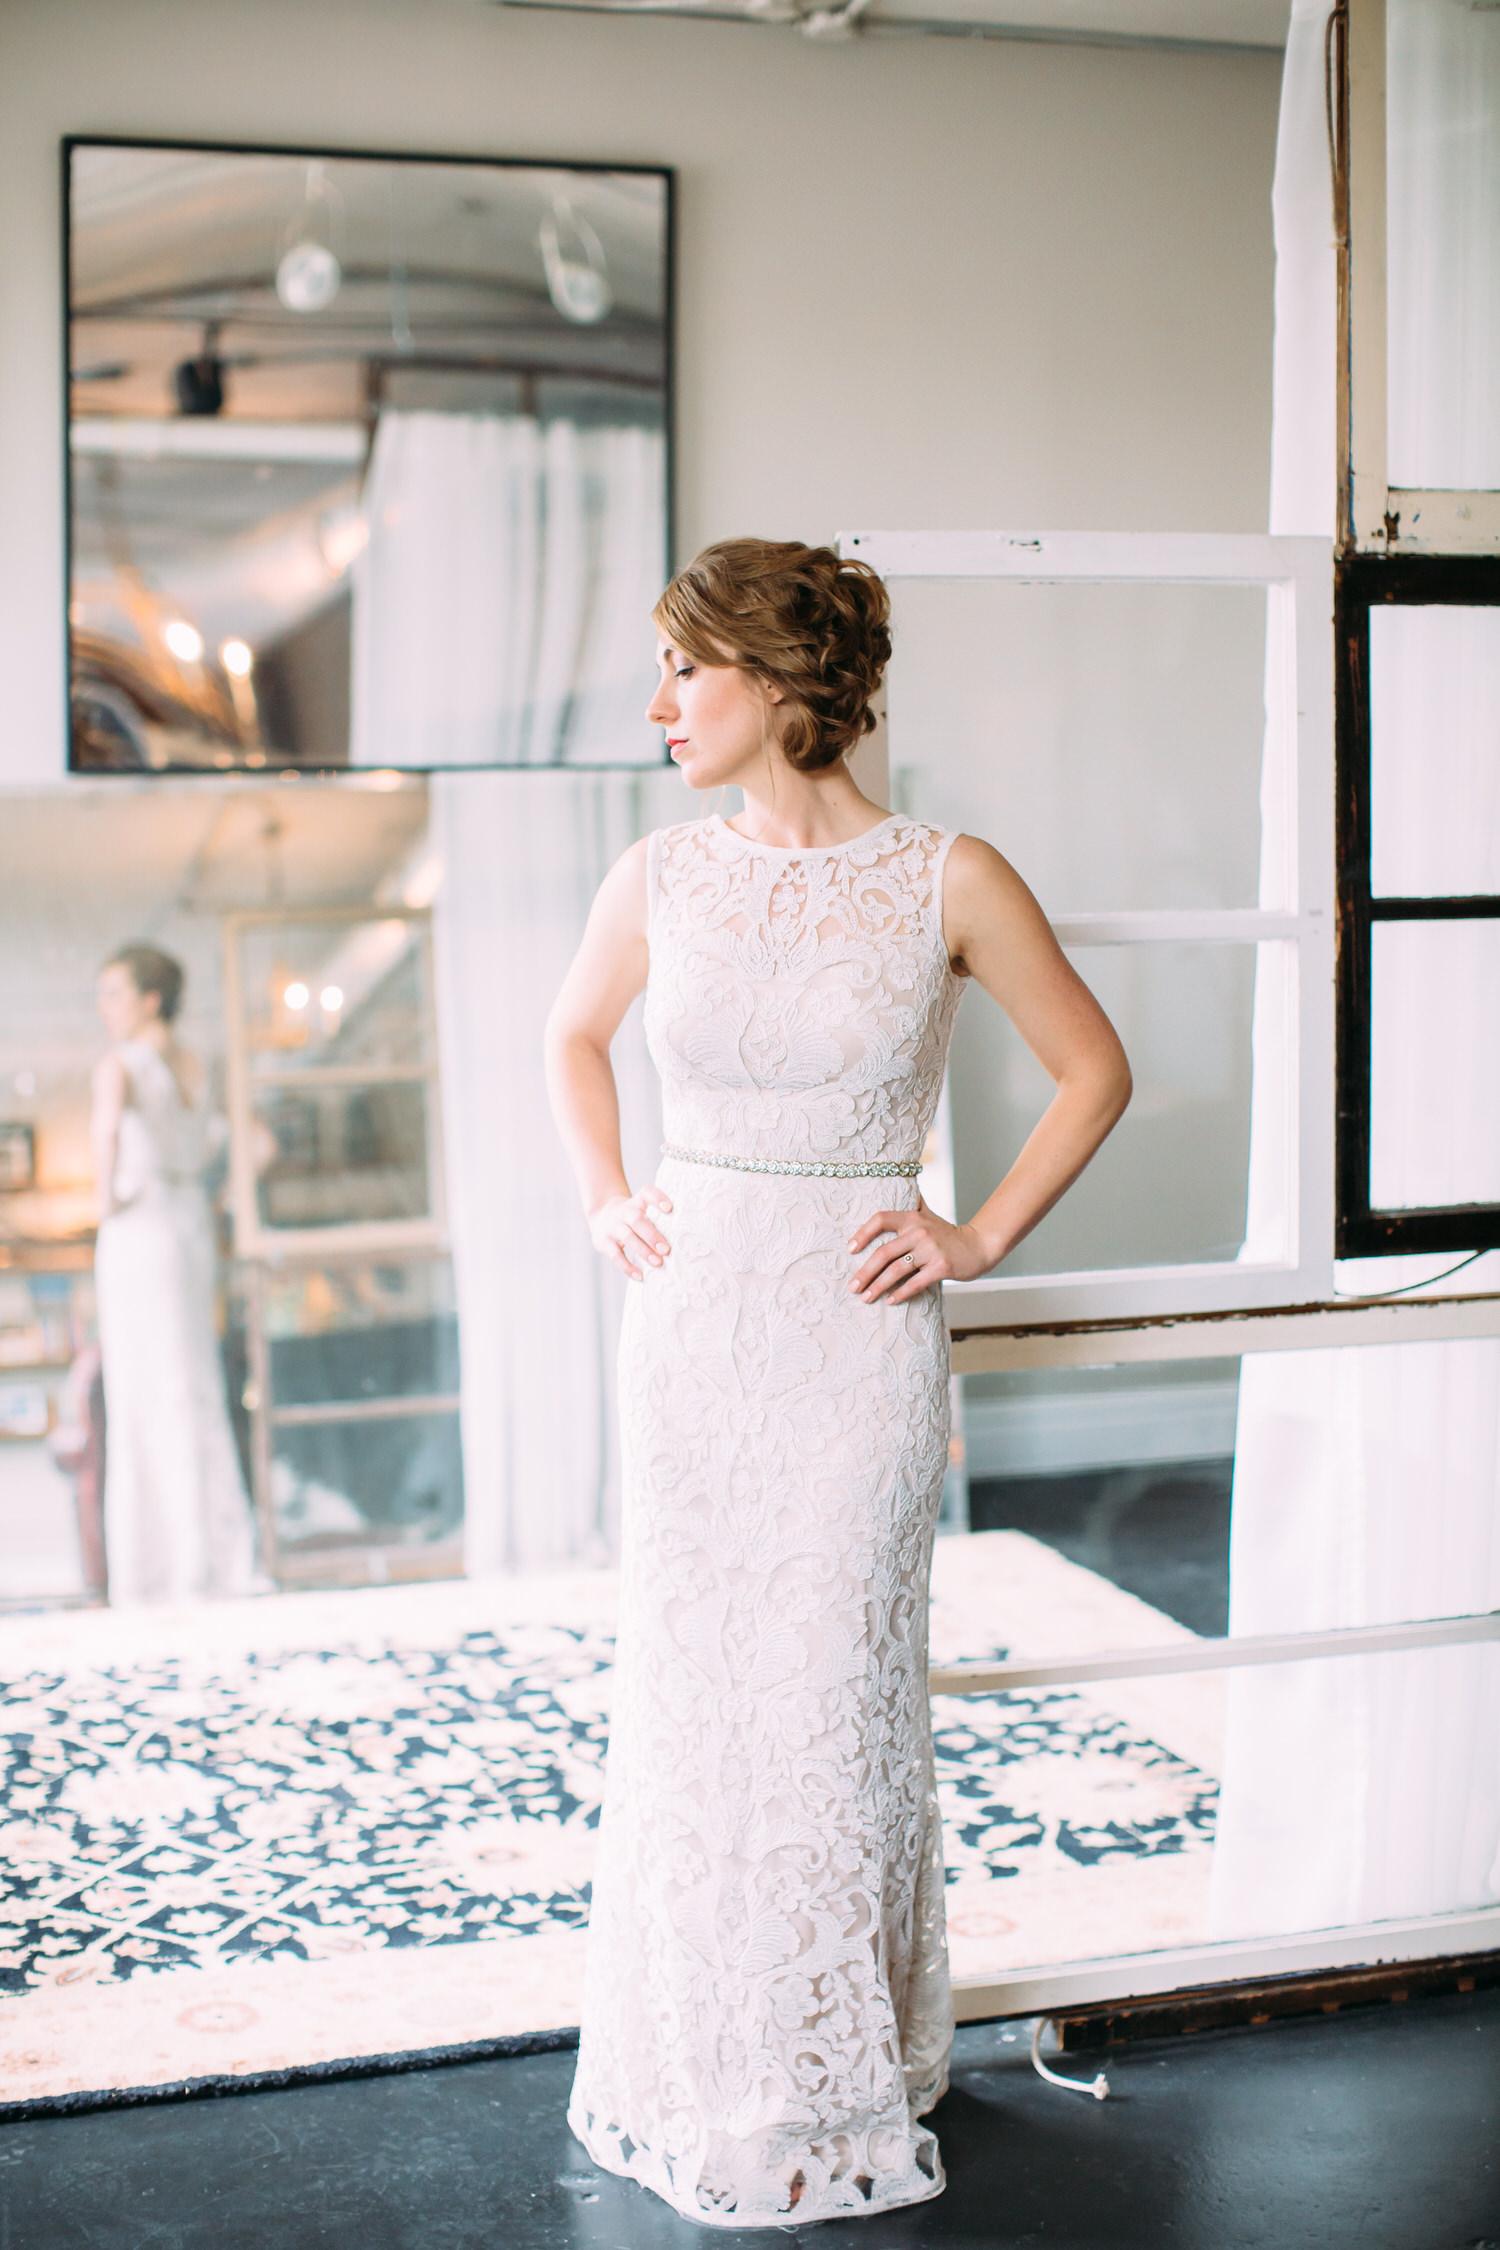 St Louis Modern Bride. Wedding photographer